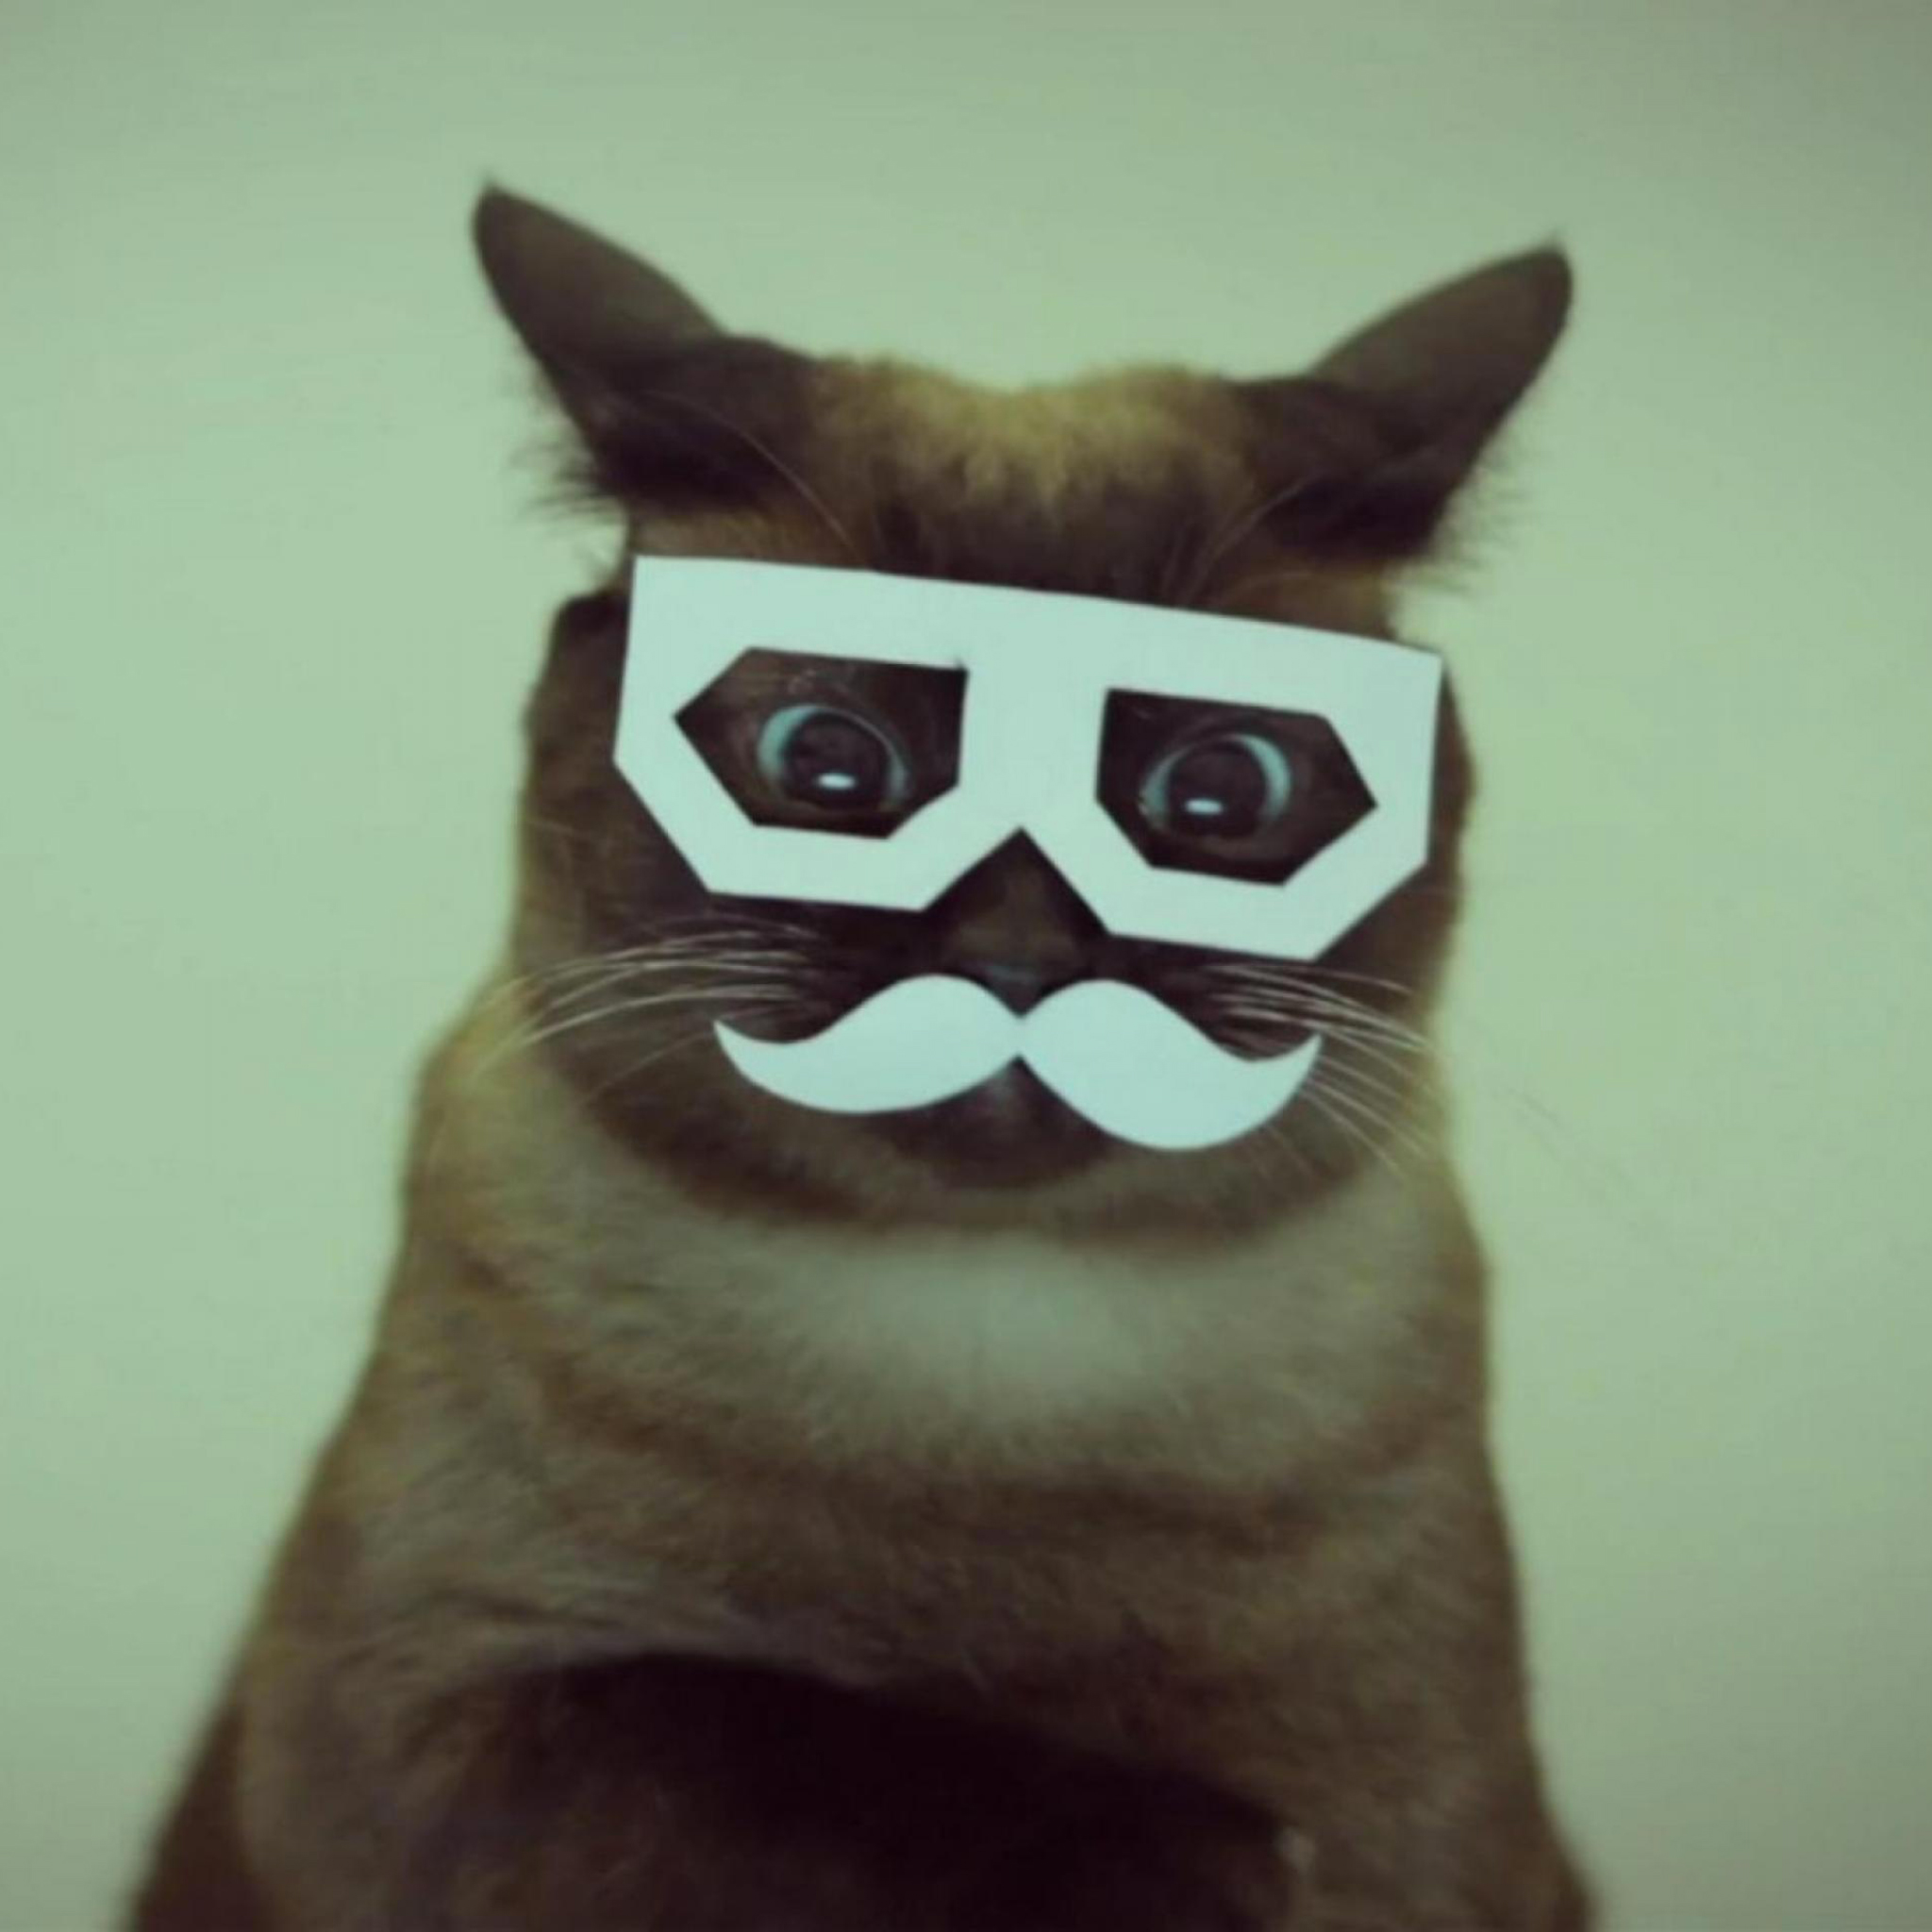 Mustache Cats 3Wallpapers IPad